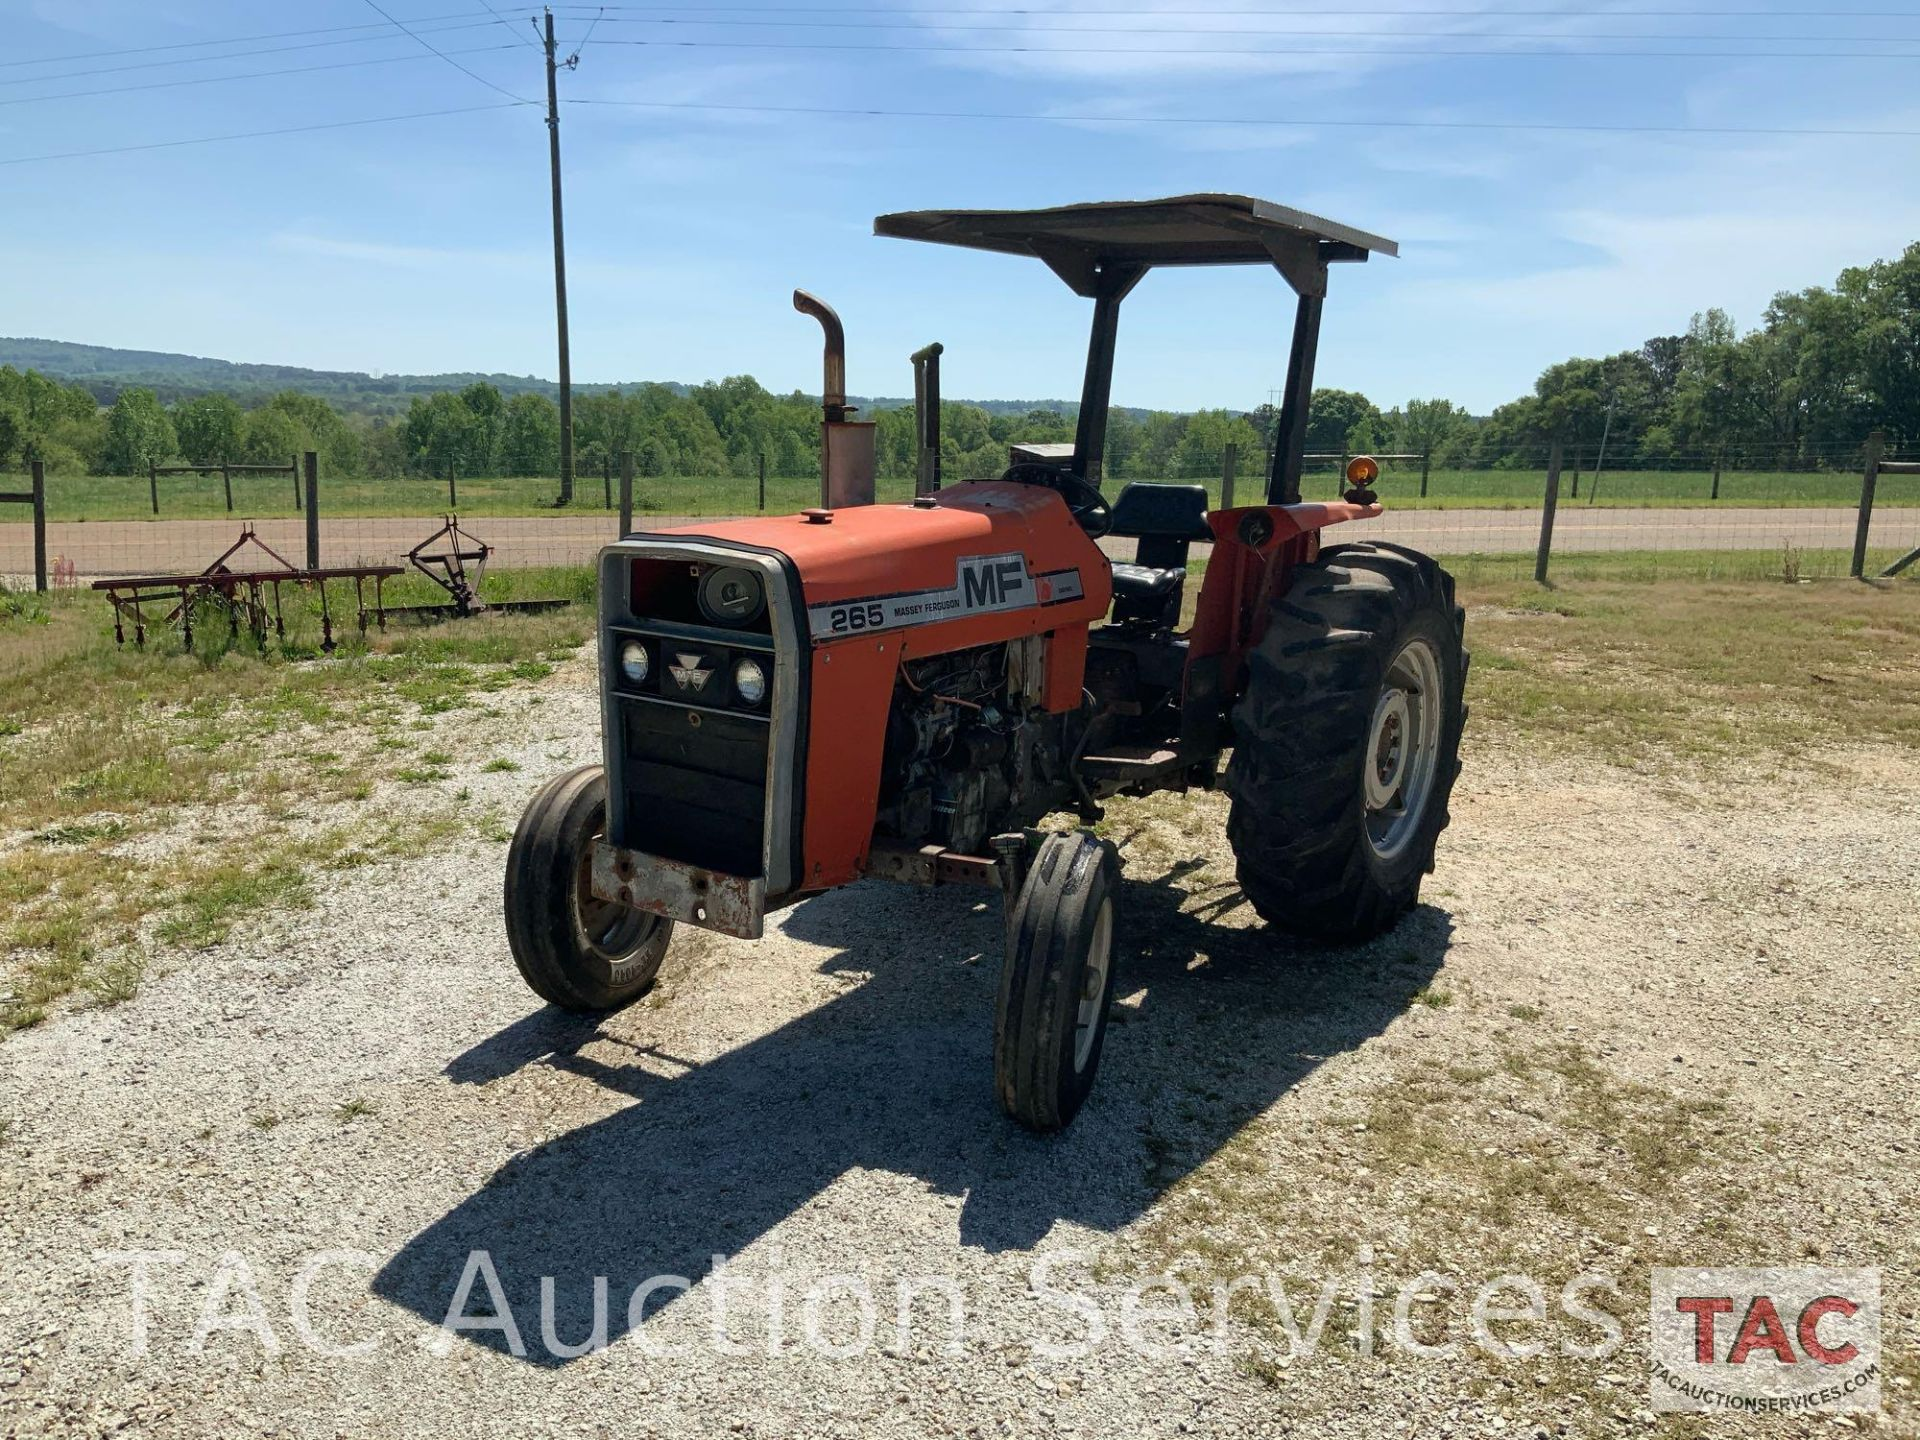 Massey Ferguson 265 FarmTractor - Image 3 of 23